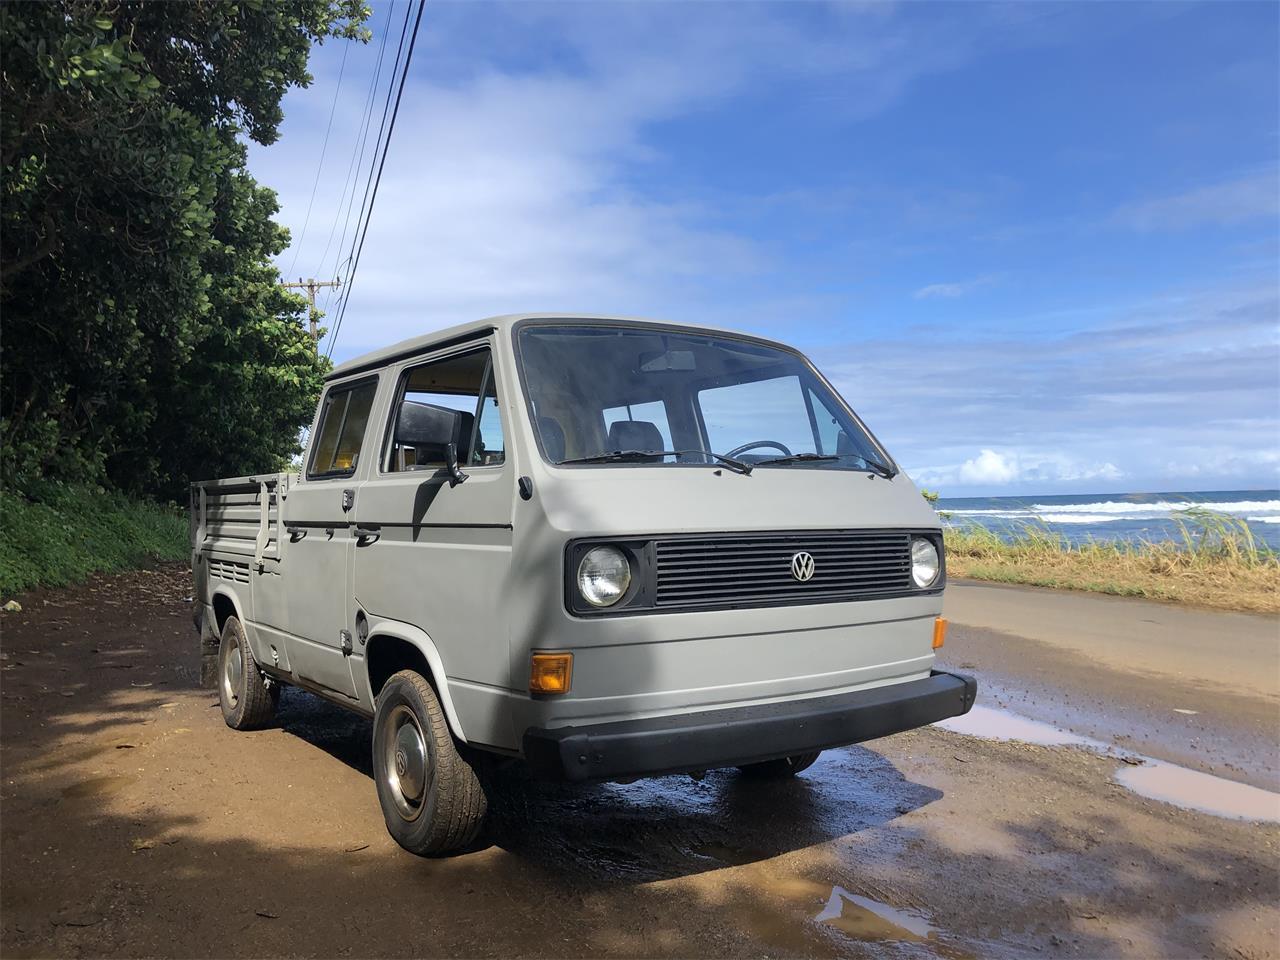 1982 Volkswagen Transporter (CC-1422062) for sale in Kilauea, Hawaii